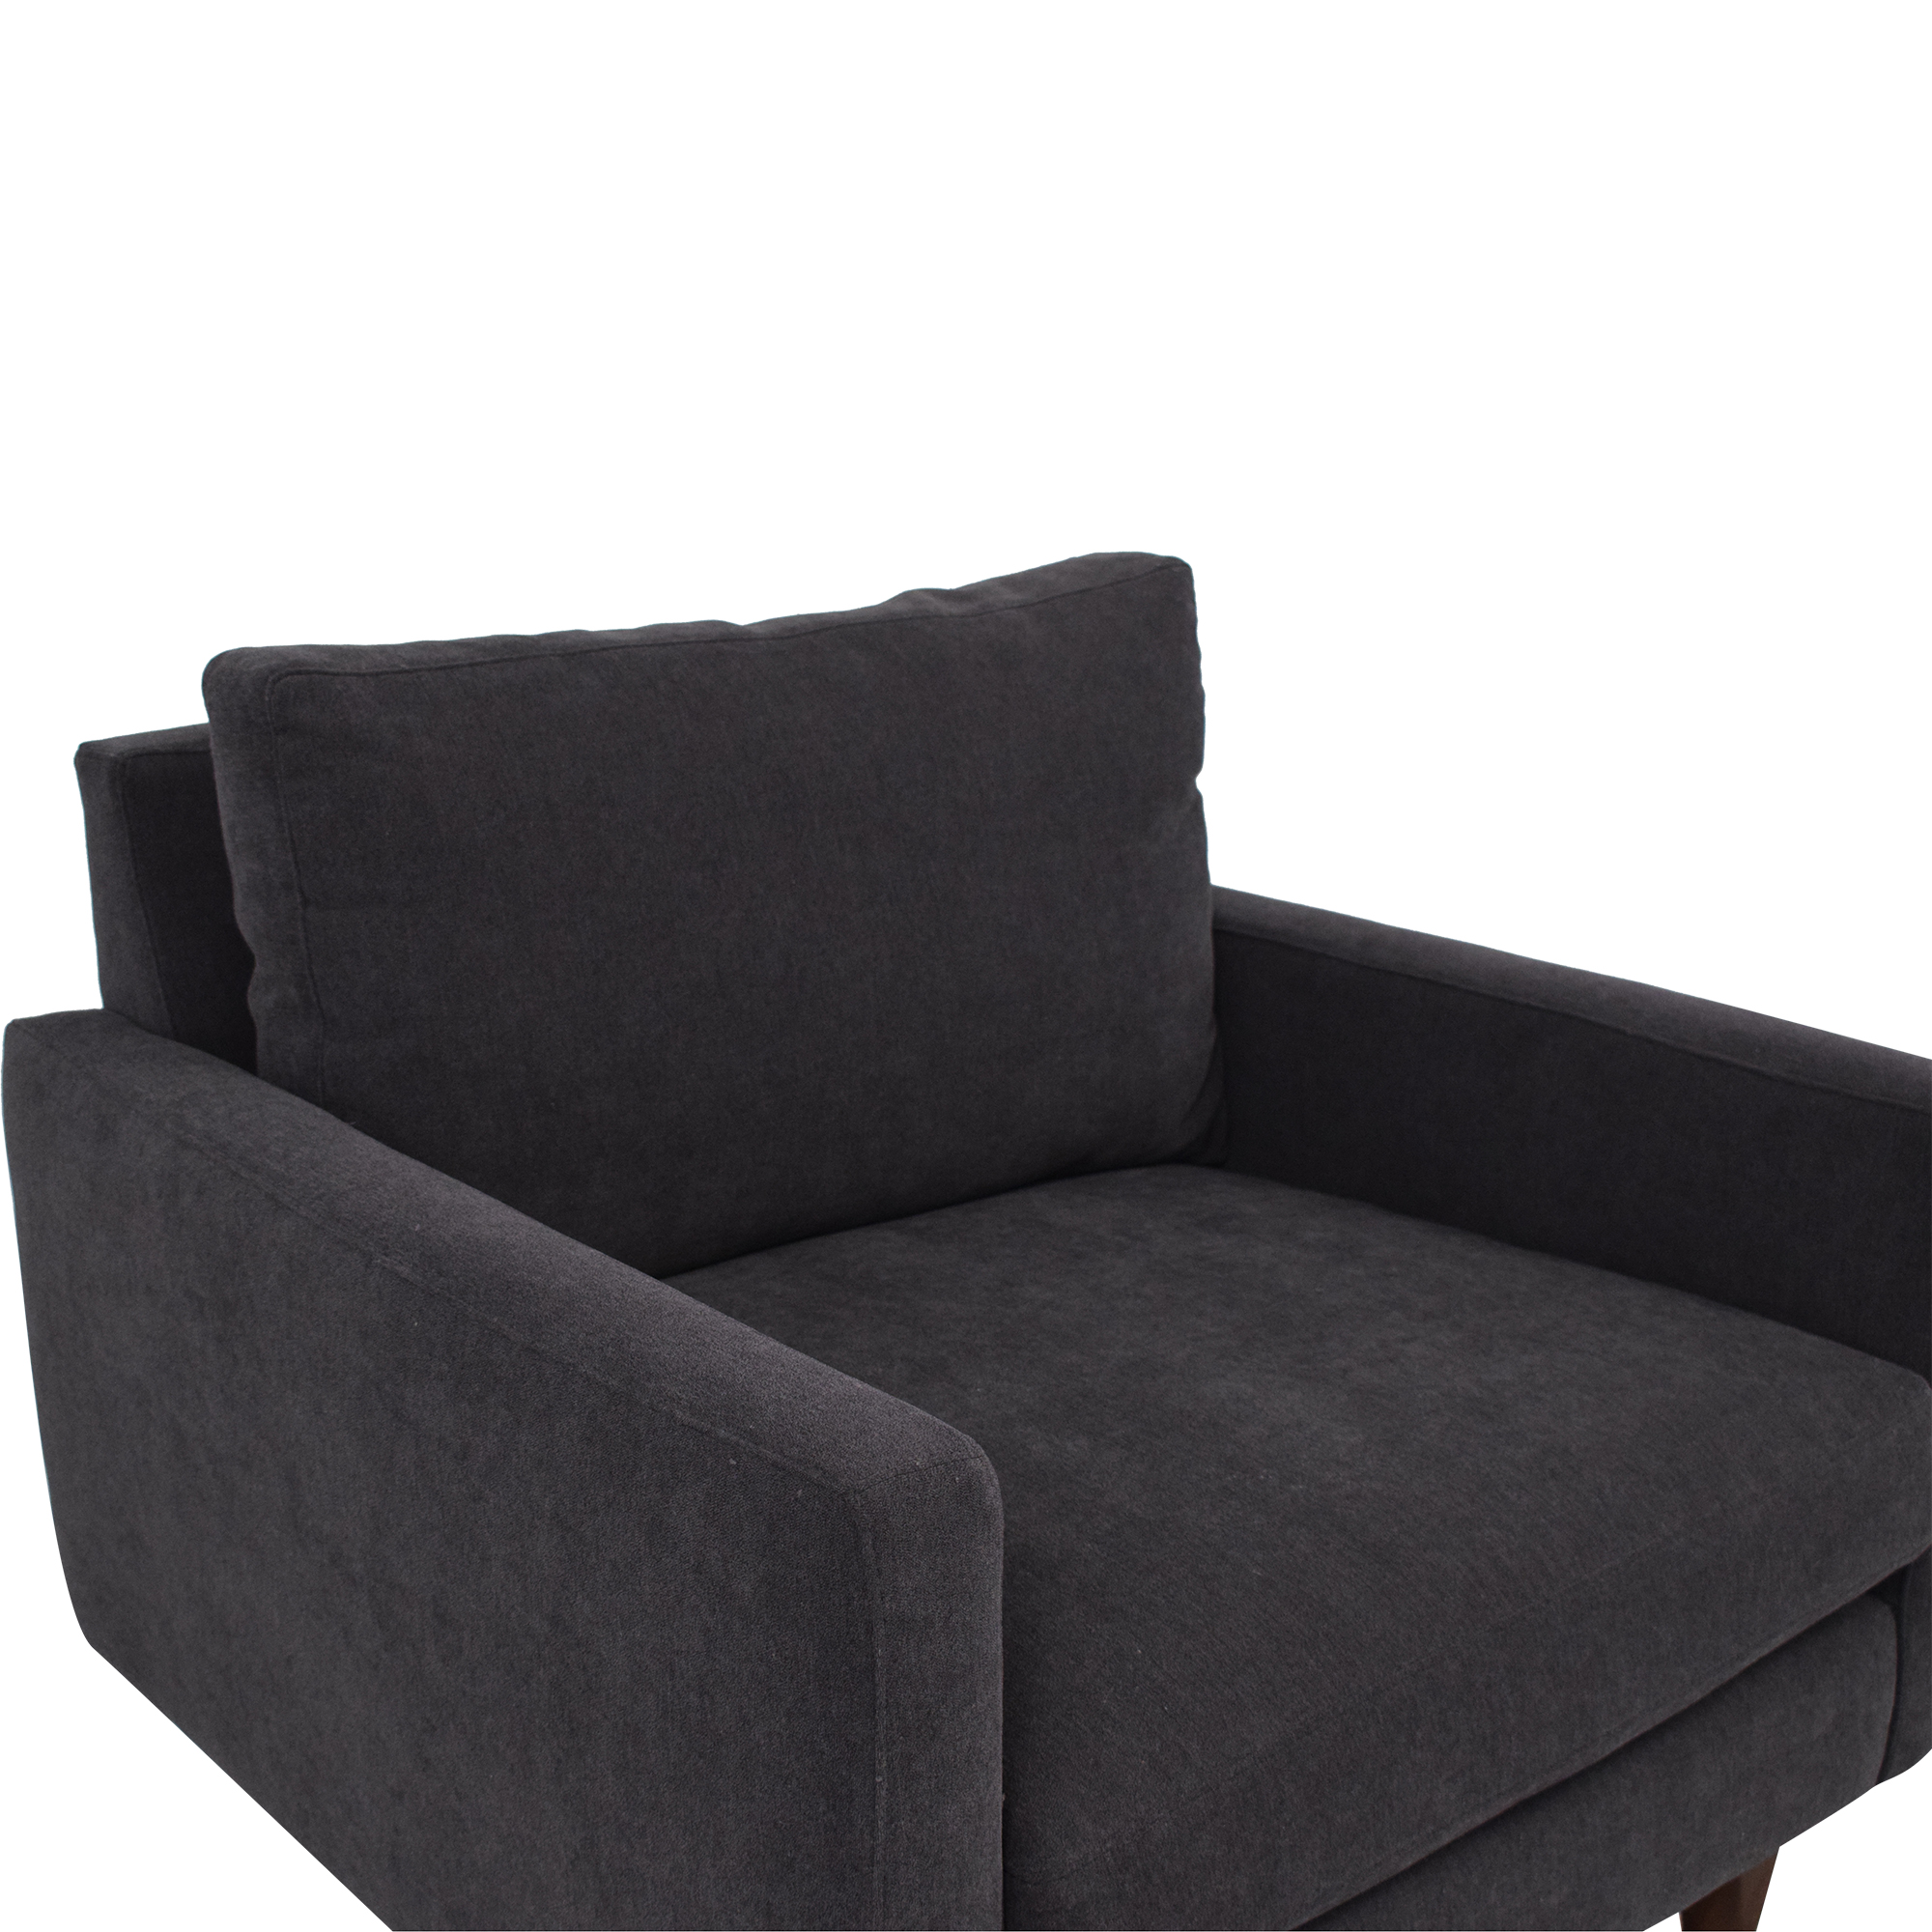 Room & Board Room & Board Jasper Chair for sale